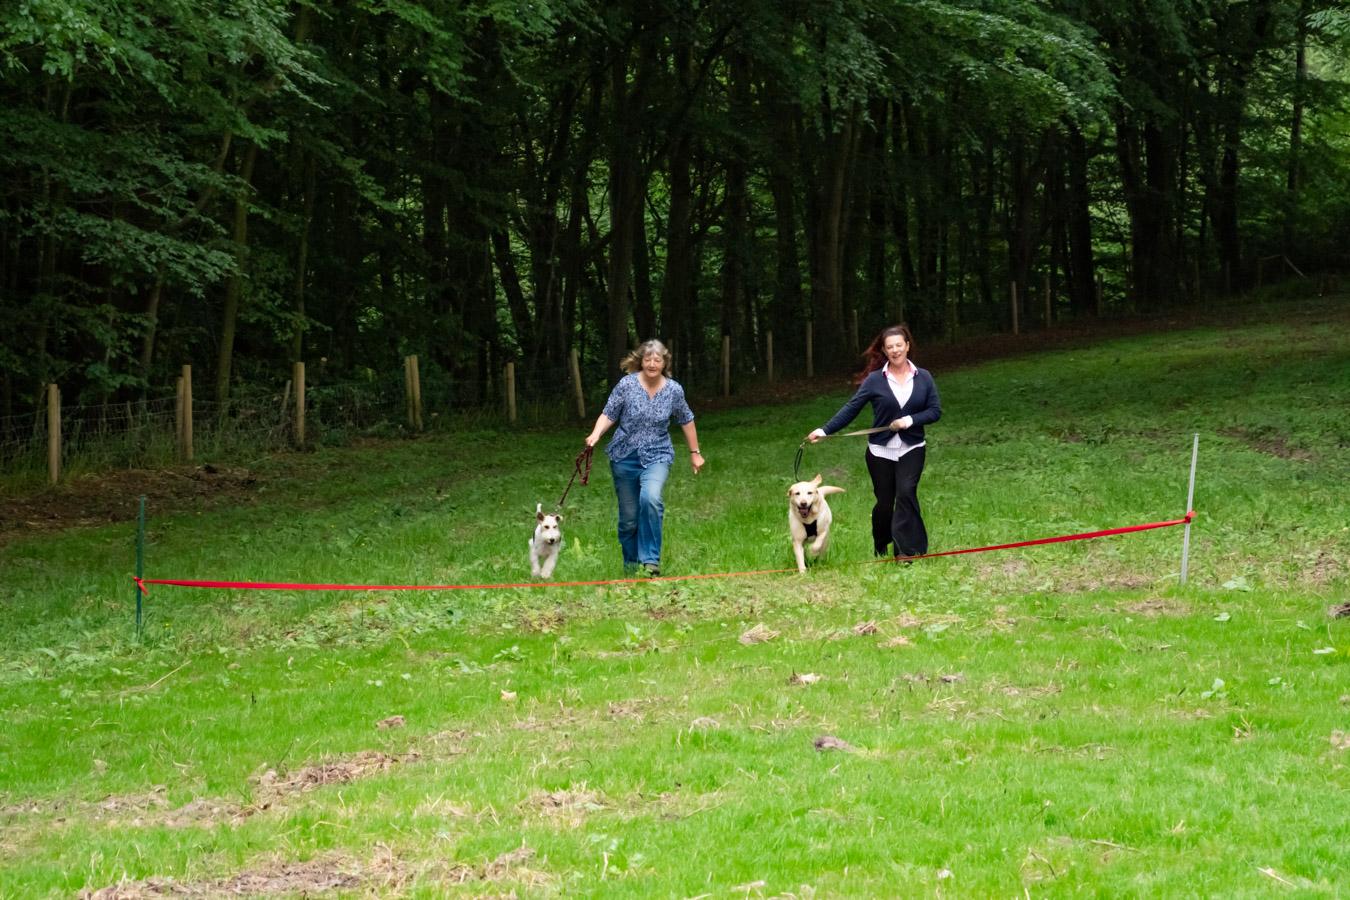 Monkton-Wyld-Best-Camping-Caravanning-West-Dorset-Dog-Friendly-Walk-6